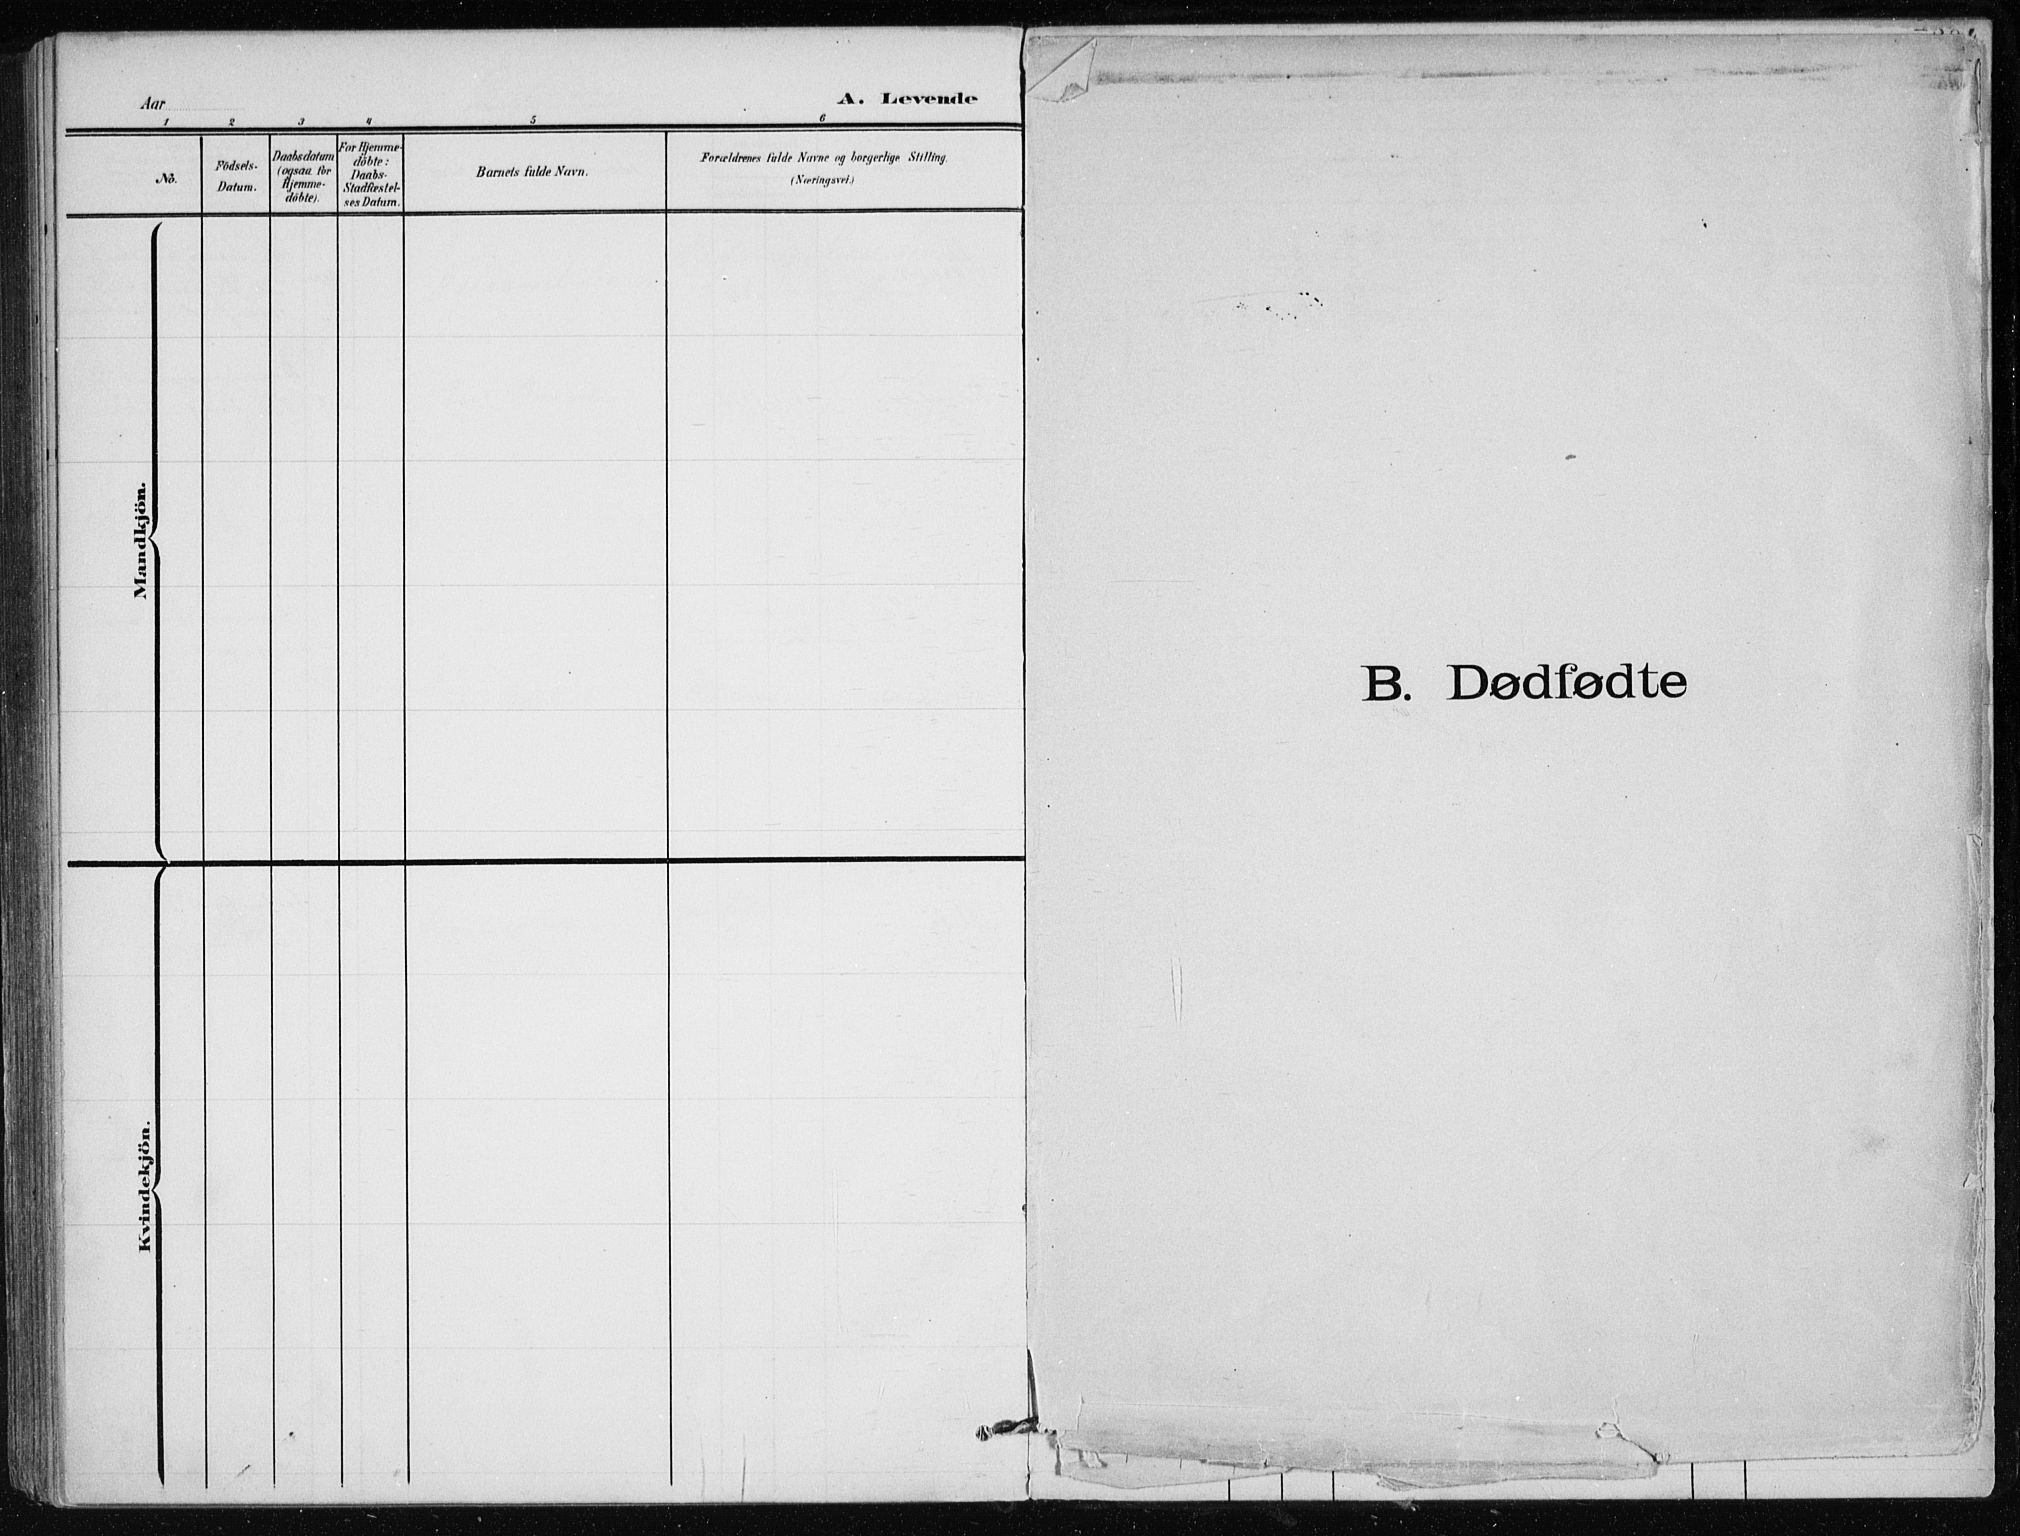 SAT, Ministerialprotokoller, klokkerbøker og fødselsregistre - Nordland, 866/L0941: Ministerialbok nr. 866A04, 1901-1917